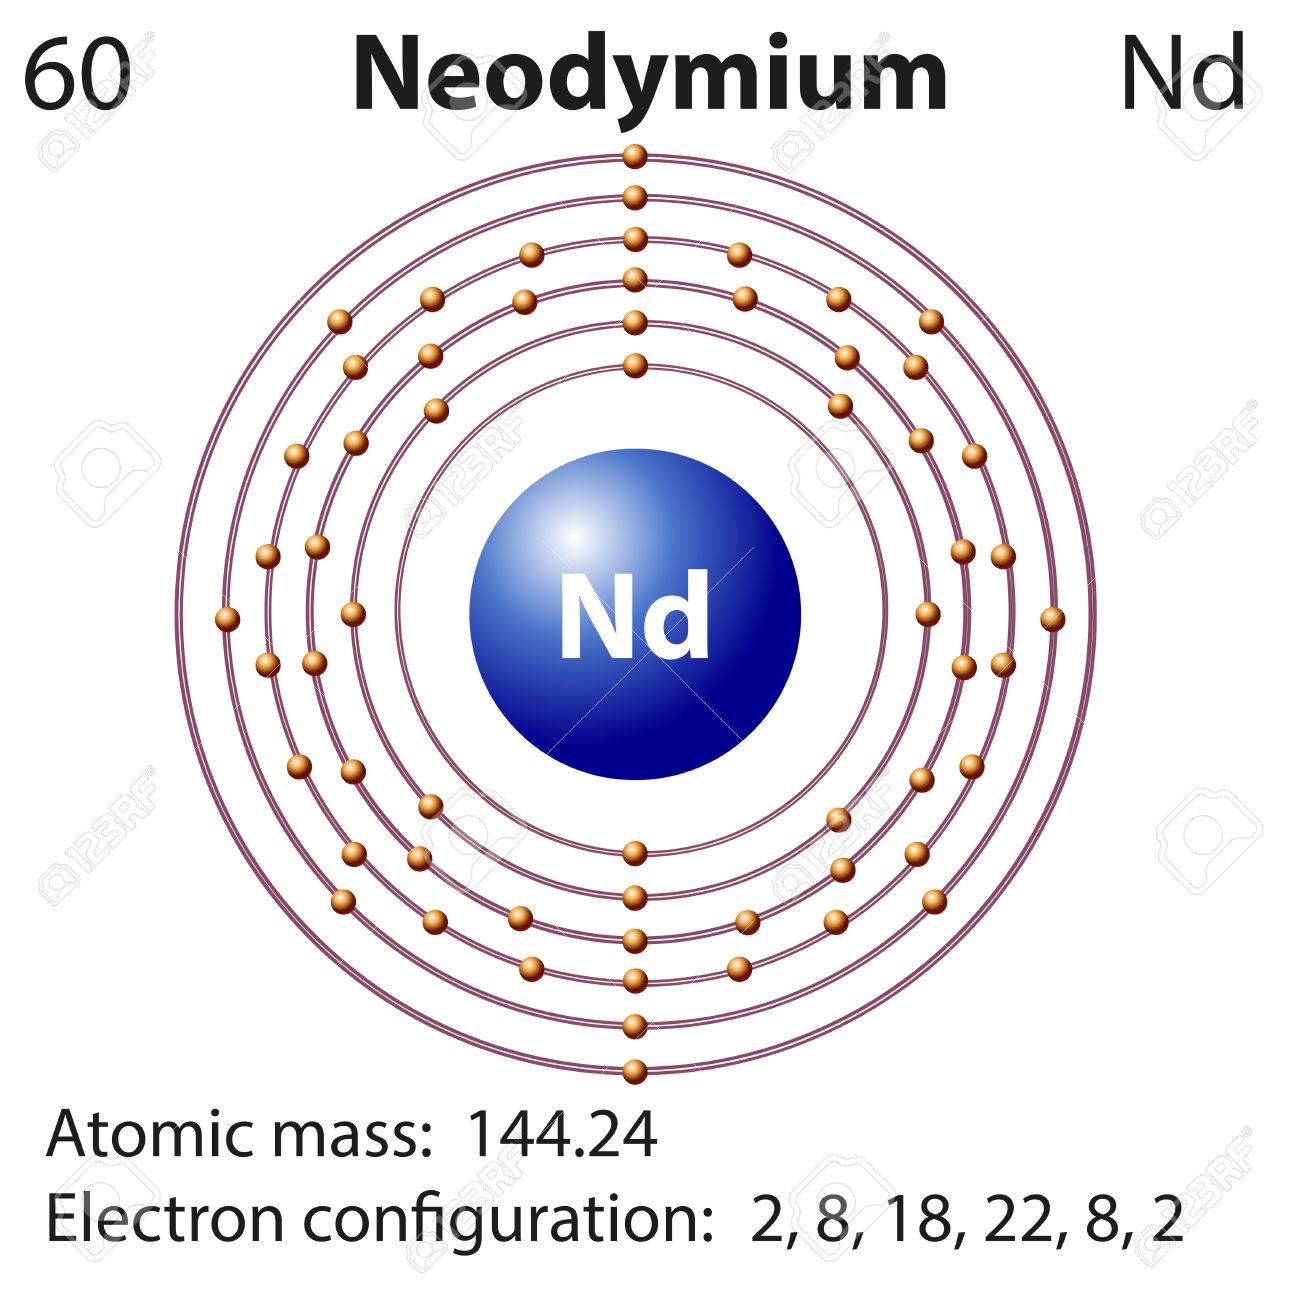 45062647 Symbol and electron diagram for Neodymium illustration Stock Vector einsteinium orbital diagram periodic table \u2022 wiring diagram  at panicattacktreatment.co